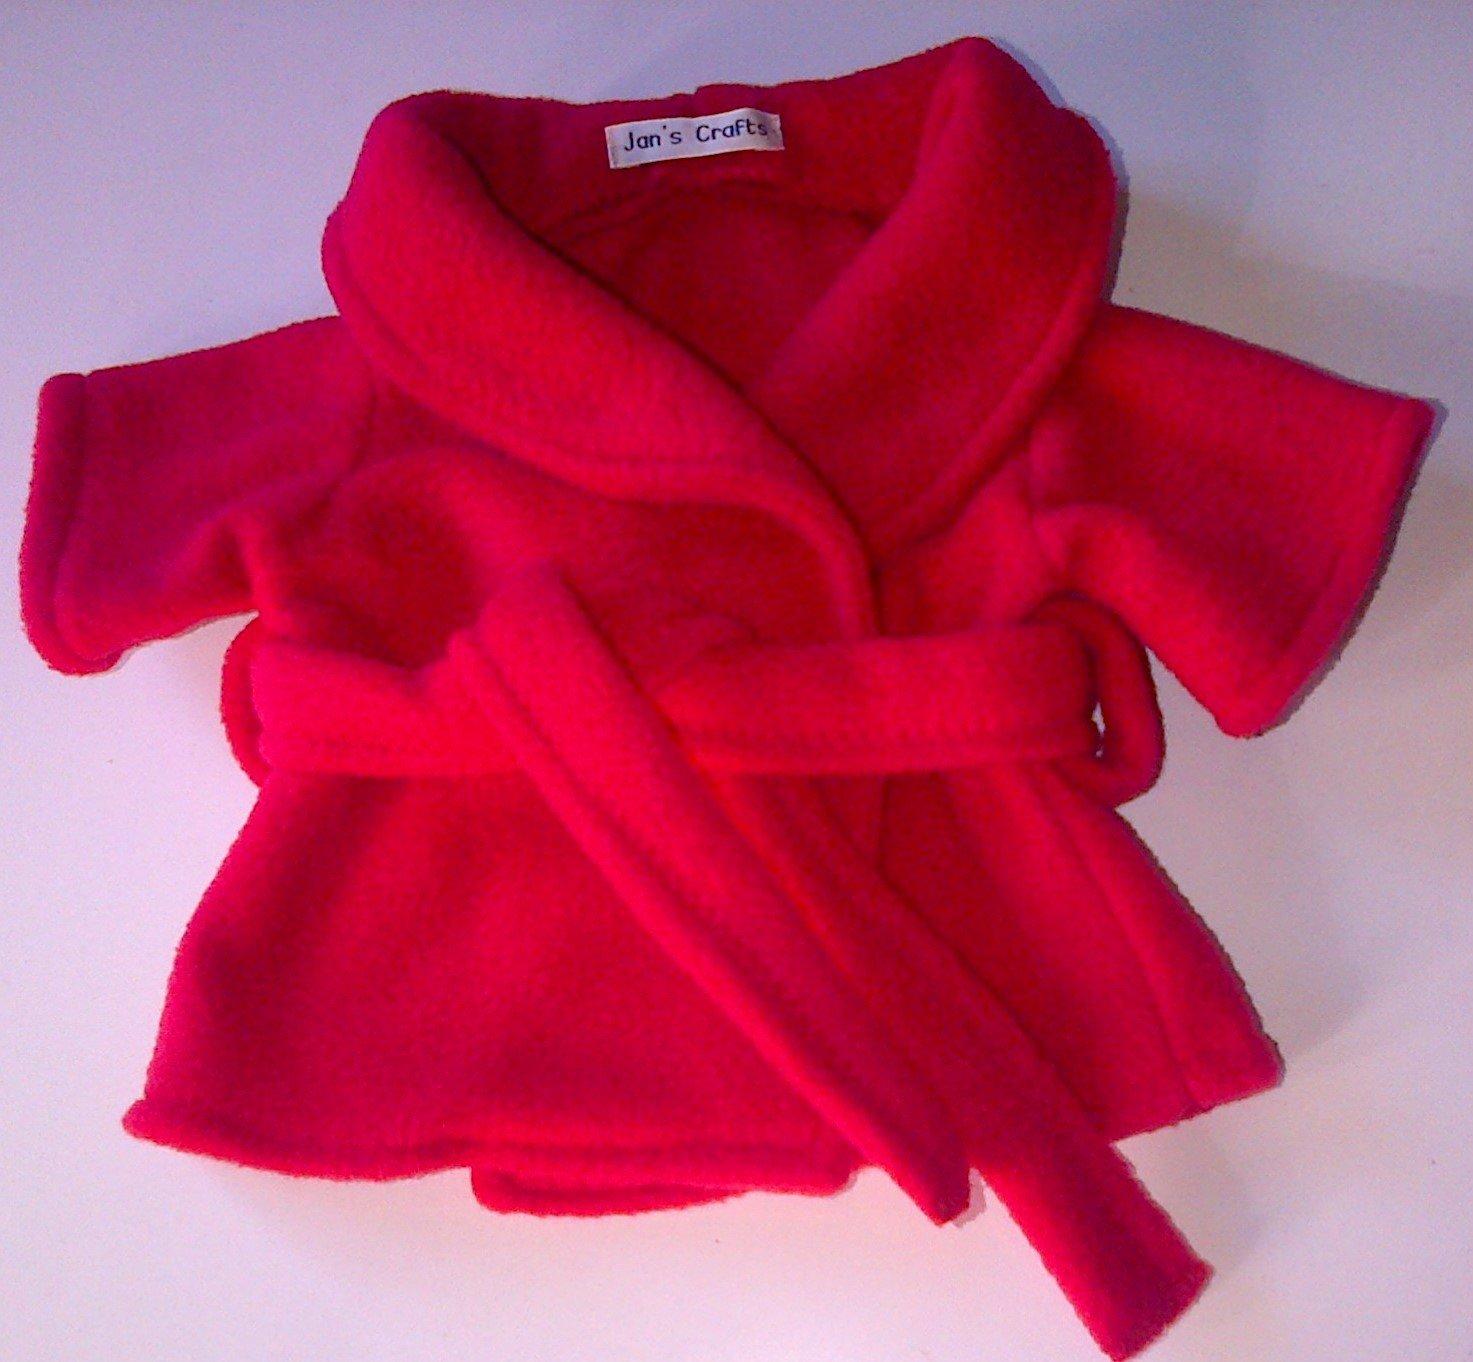 Dressing gown - red fleece